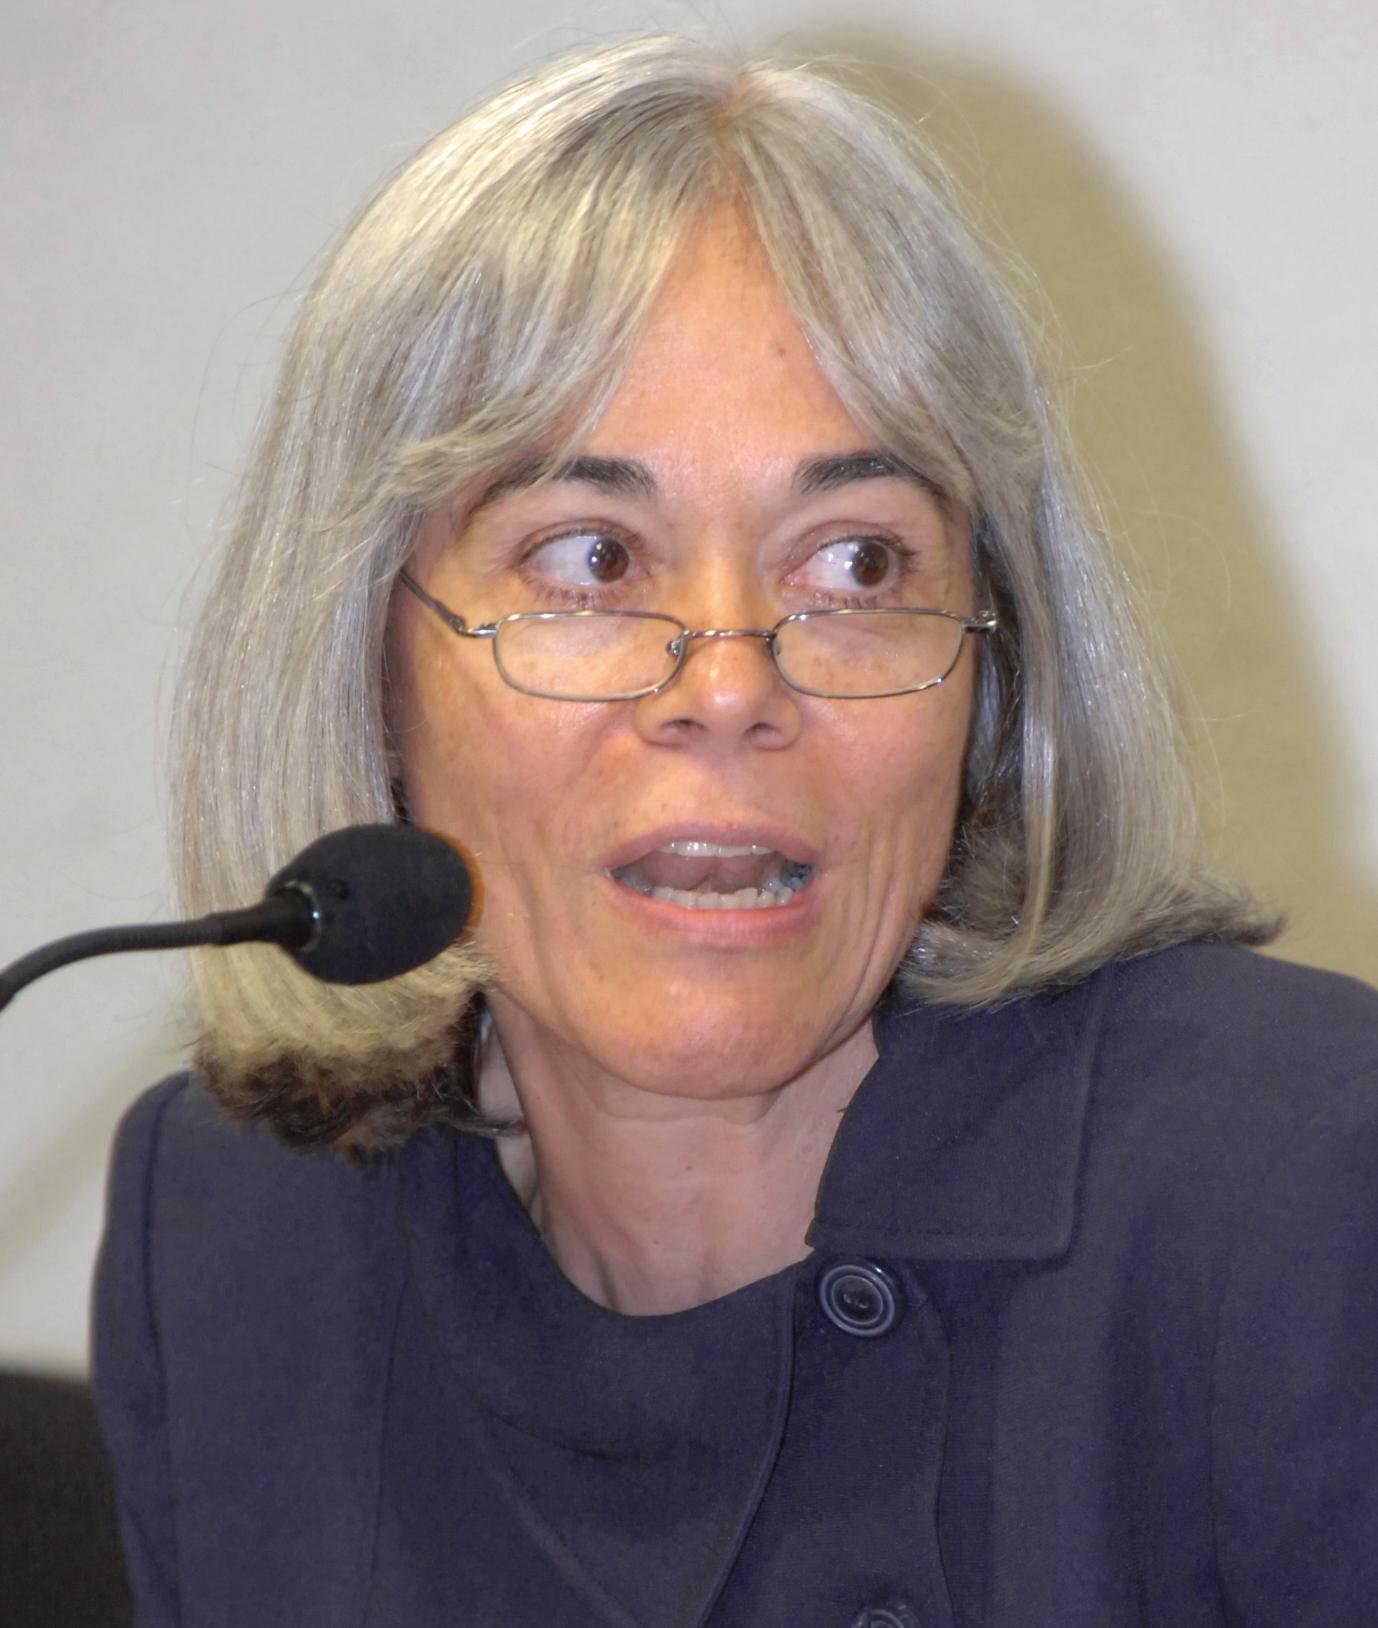 https://upload.wikimedia.org/wikipedia/commons/f/f2/Maria_Thereza_Rocha_de_Assis_Moura.JPG